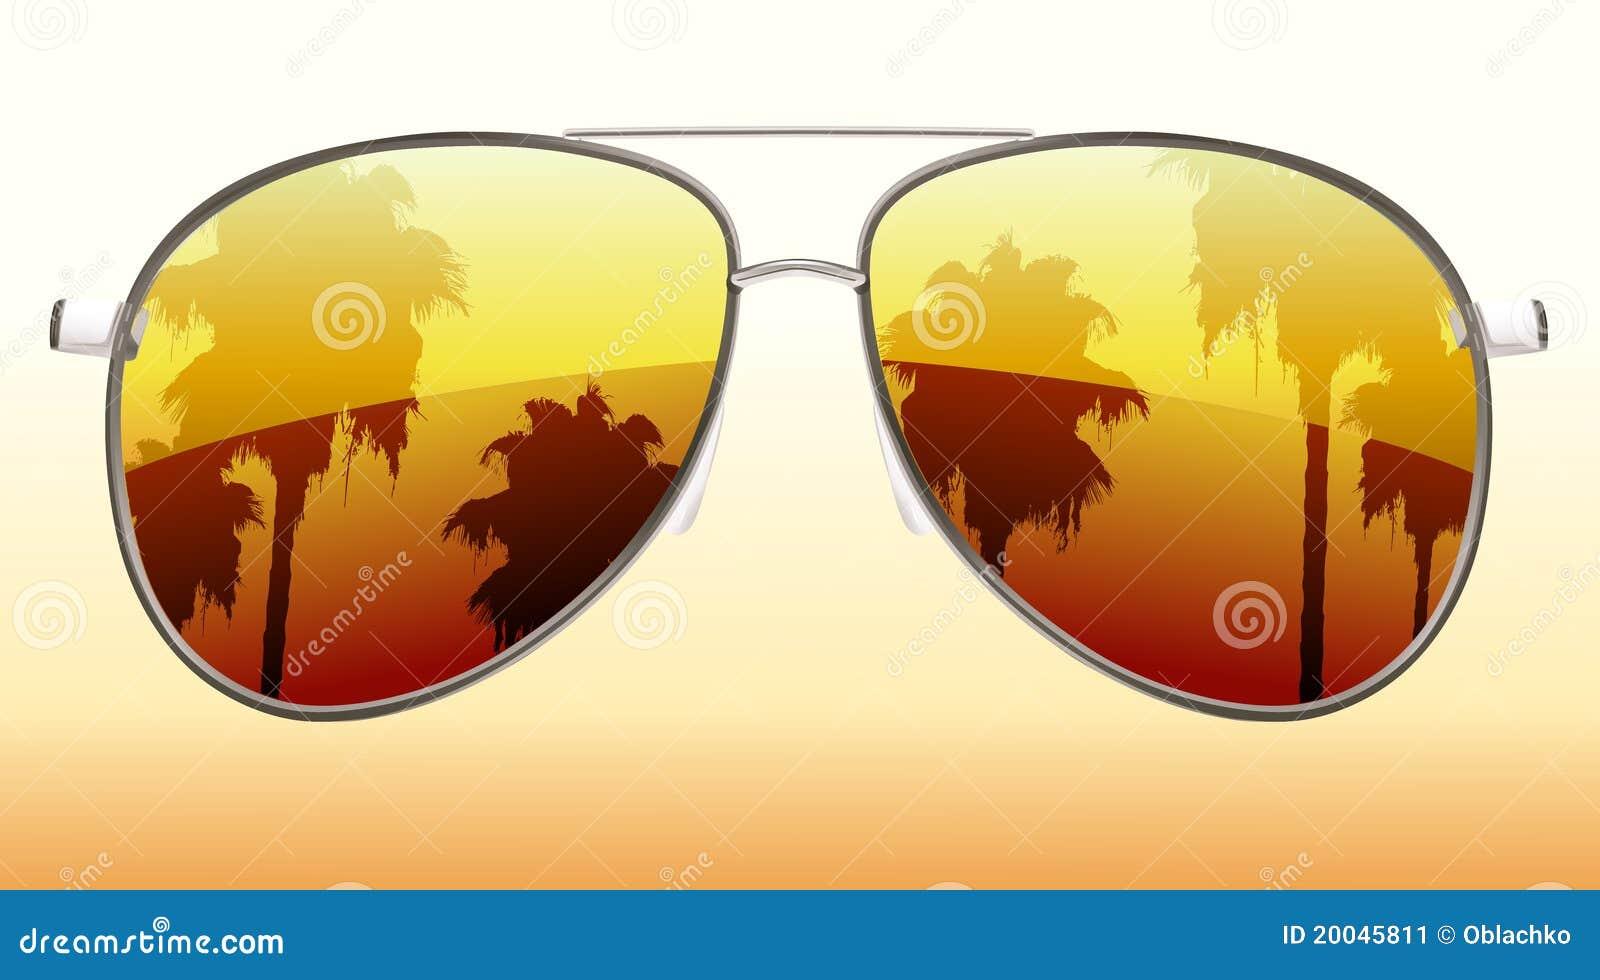 cool sunglasses stock image image 20045811 paw print logo brand paw print logo transparent